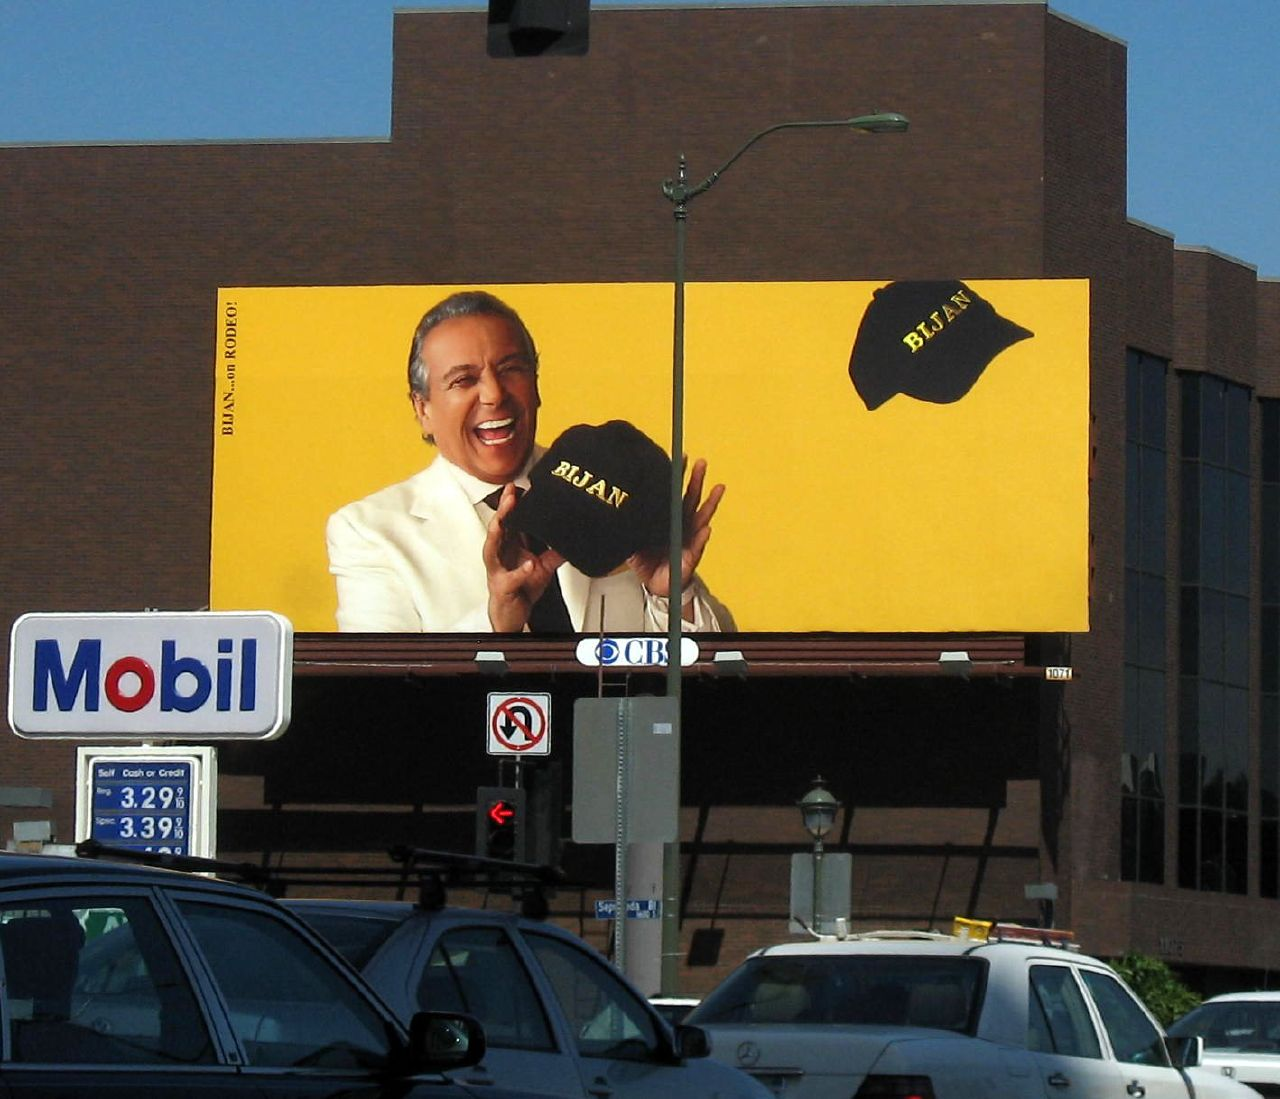 "A vintage Bijan billboard. Photo via <a href=""http://belog.jigaram.com/the-bijan-billboard-%E2%80%94-a-retrospective/"">Belog</a>."